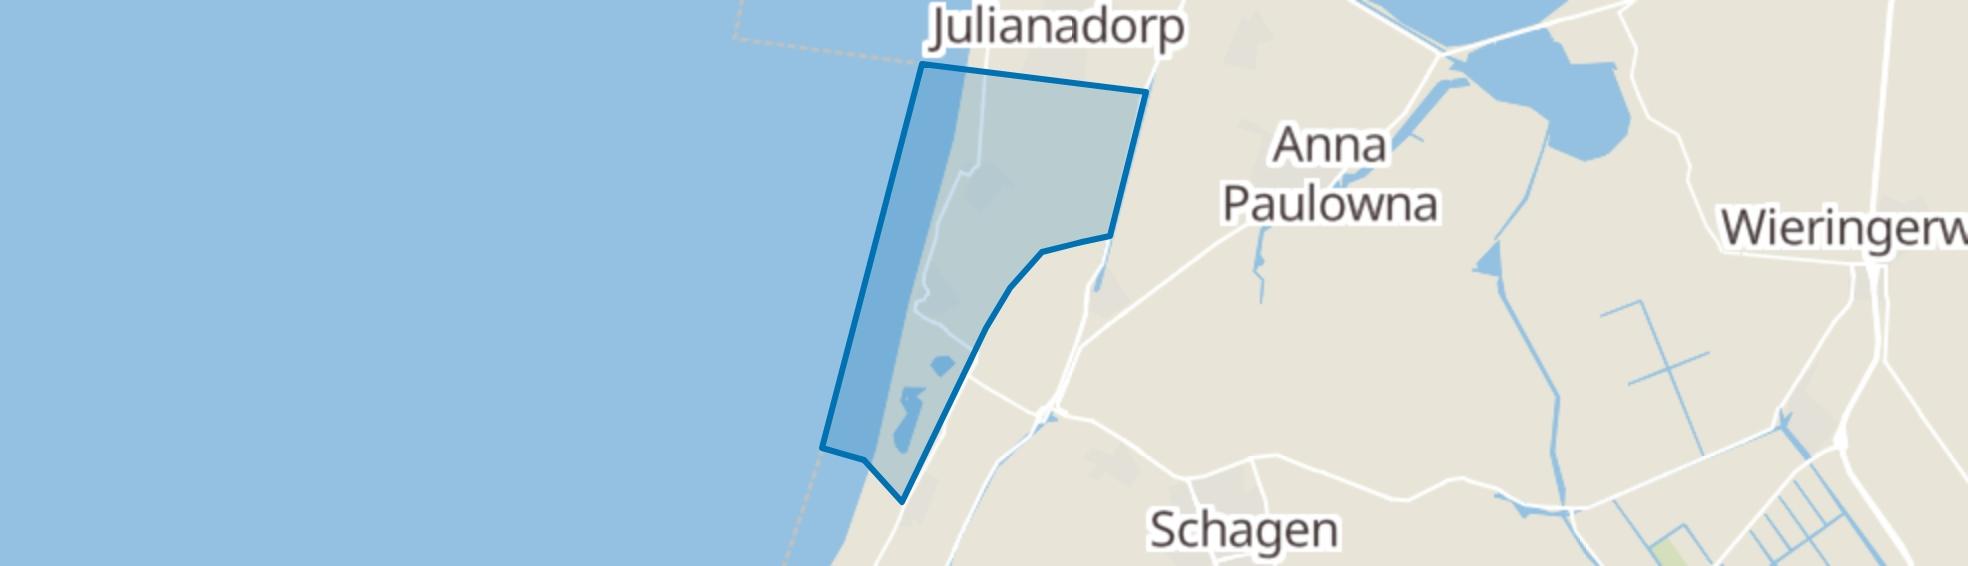 Callantsoog map